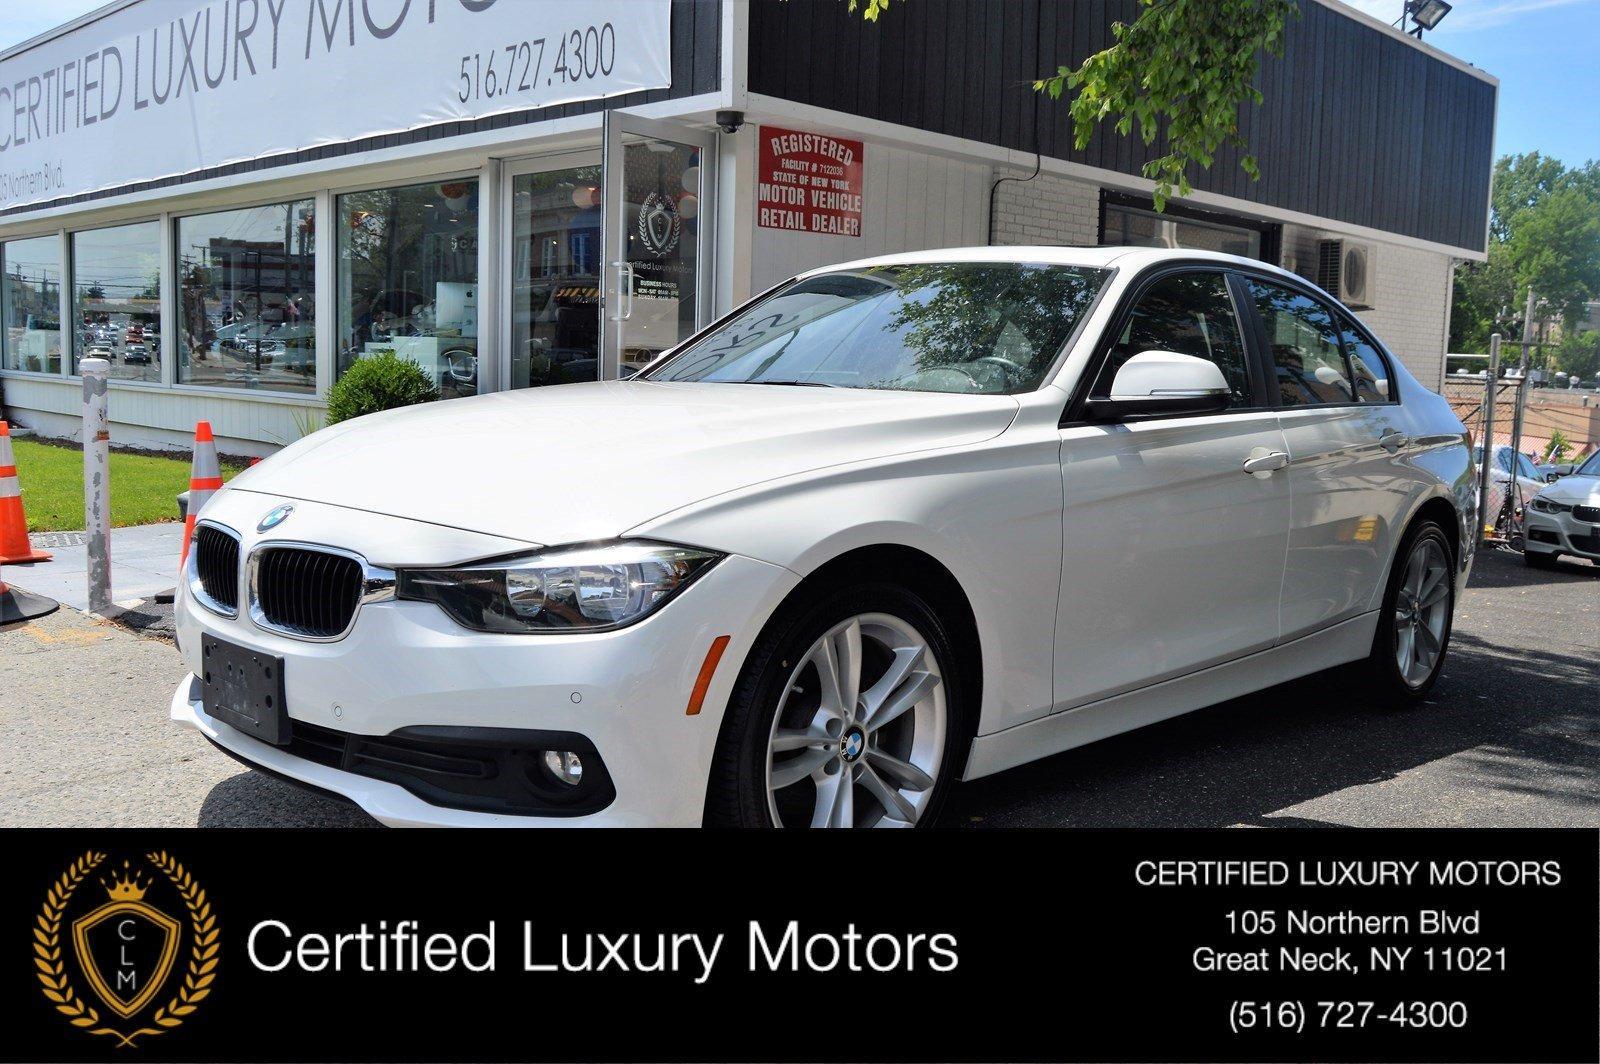 Used 2017 BMW 3 Series 320i xDrive (Navi,Sports Pkg) | Great Neck, NY